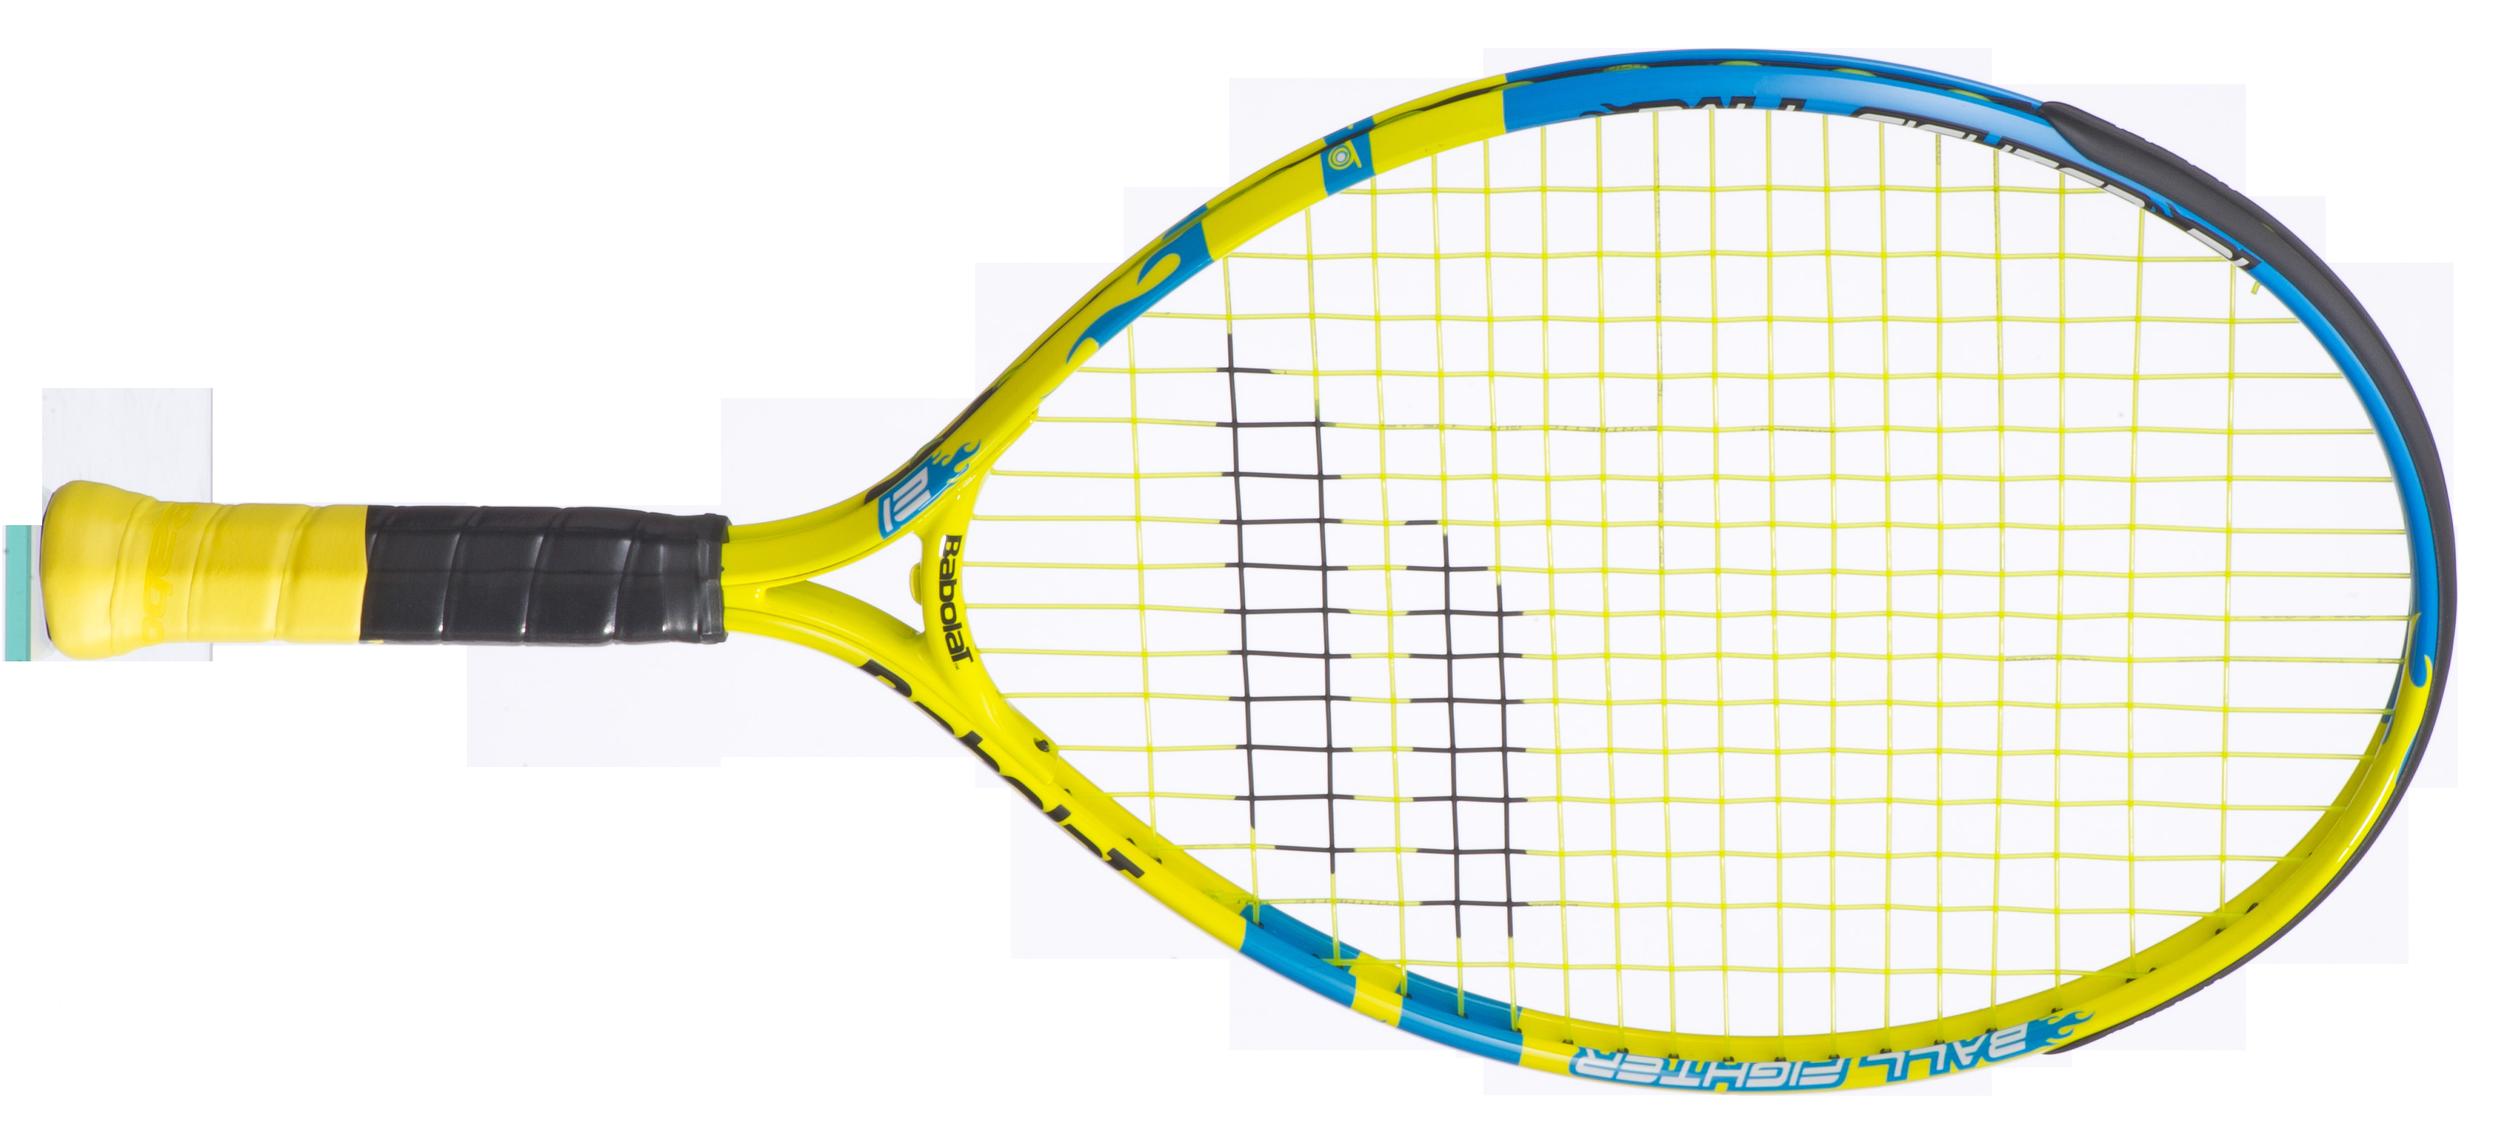 Tennis Racket Png Image Tennis Racket Rackets